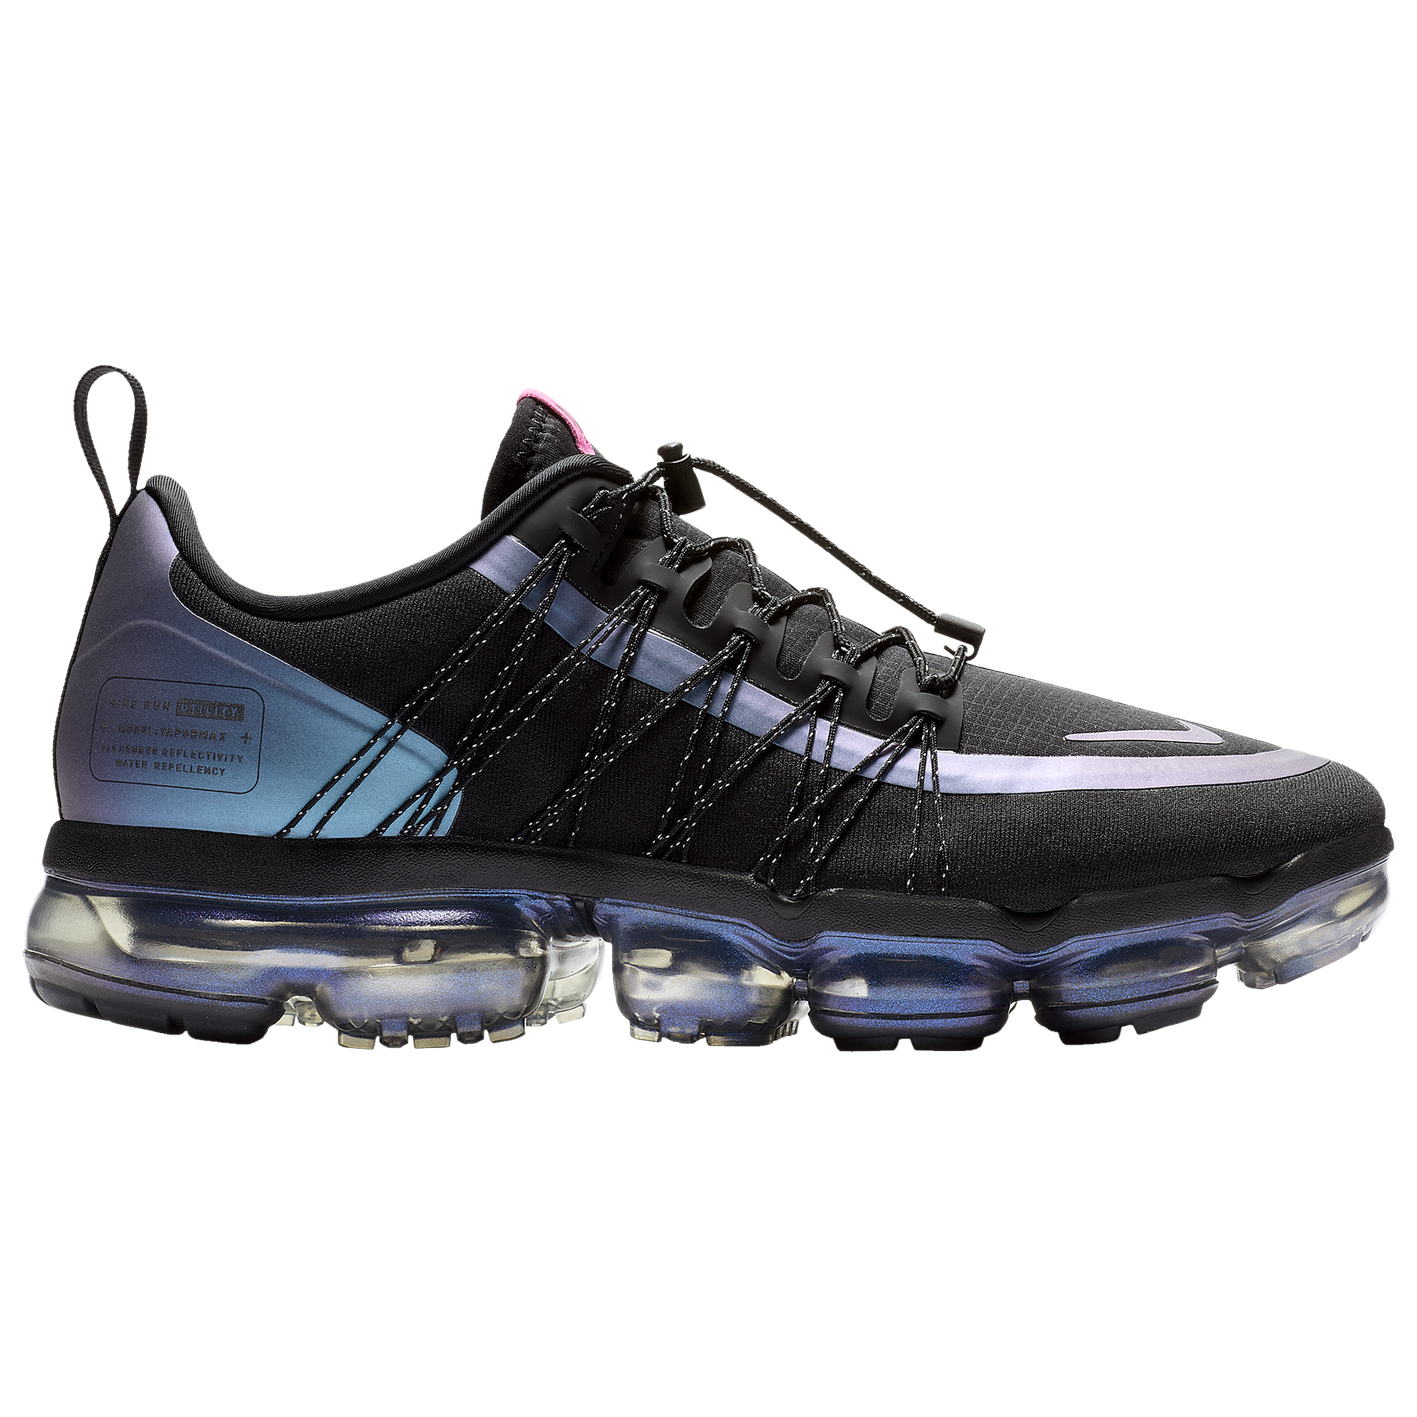 7141ca9ff914d Nike Air Vapormax Run Utility - Men s - Casual - Shoes - Black Blue